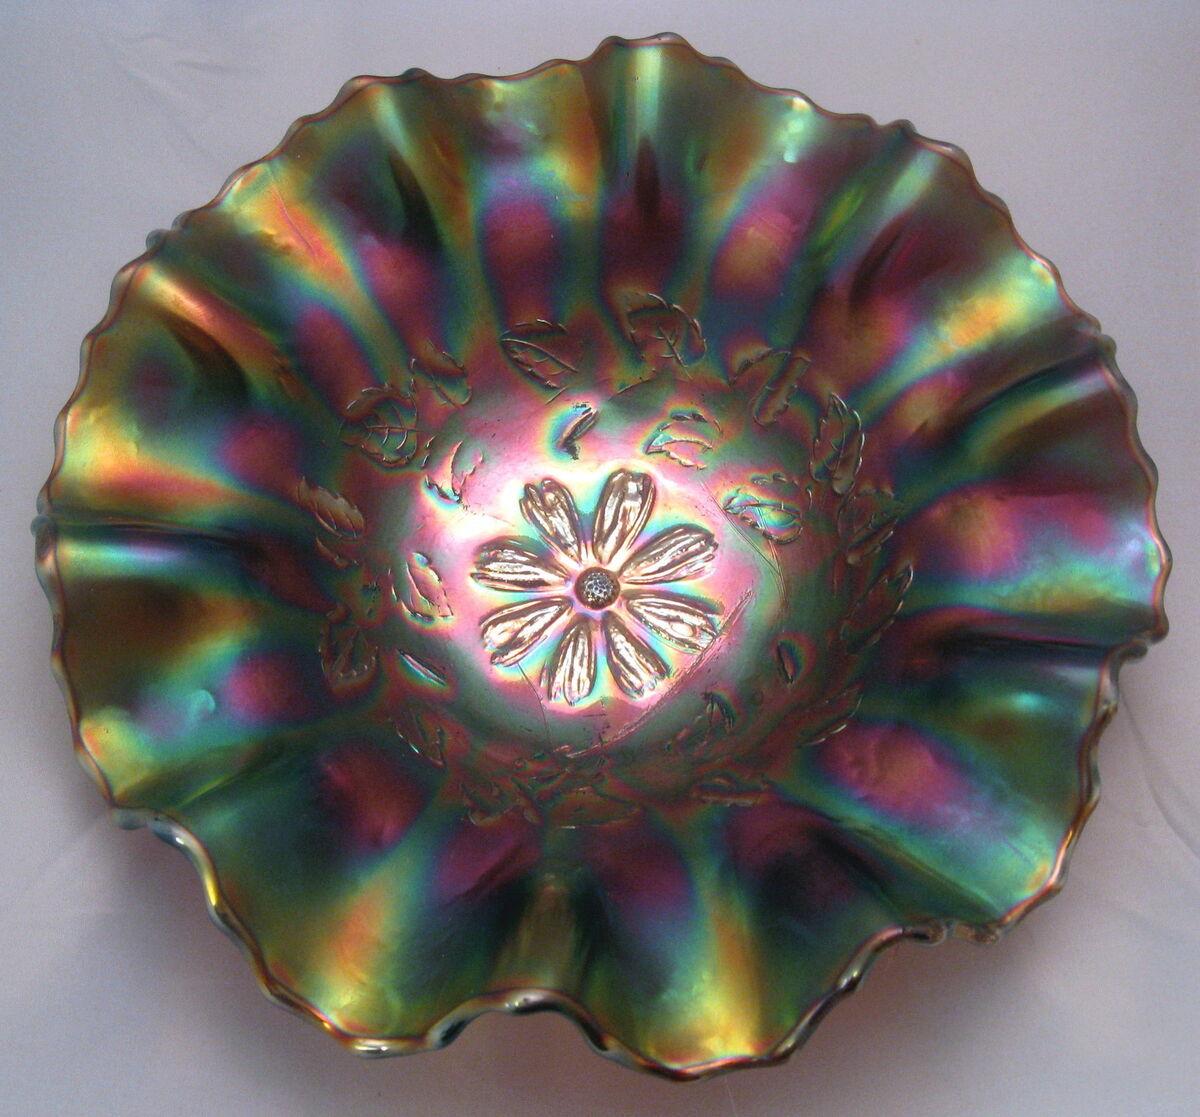 Dugan Amethyst Cosmos Variant 9 1 4 Carnival Glass Bowl w Ten Ruffles